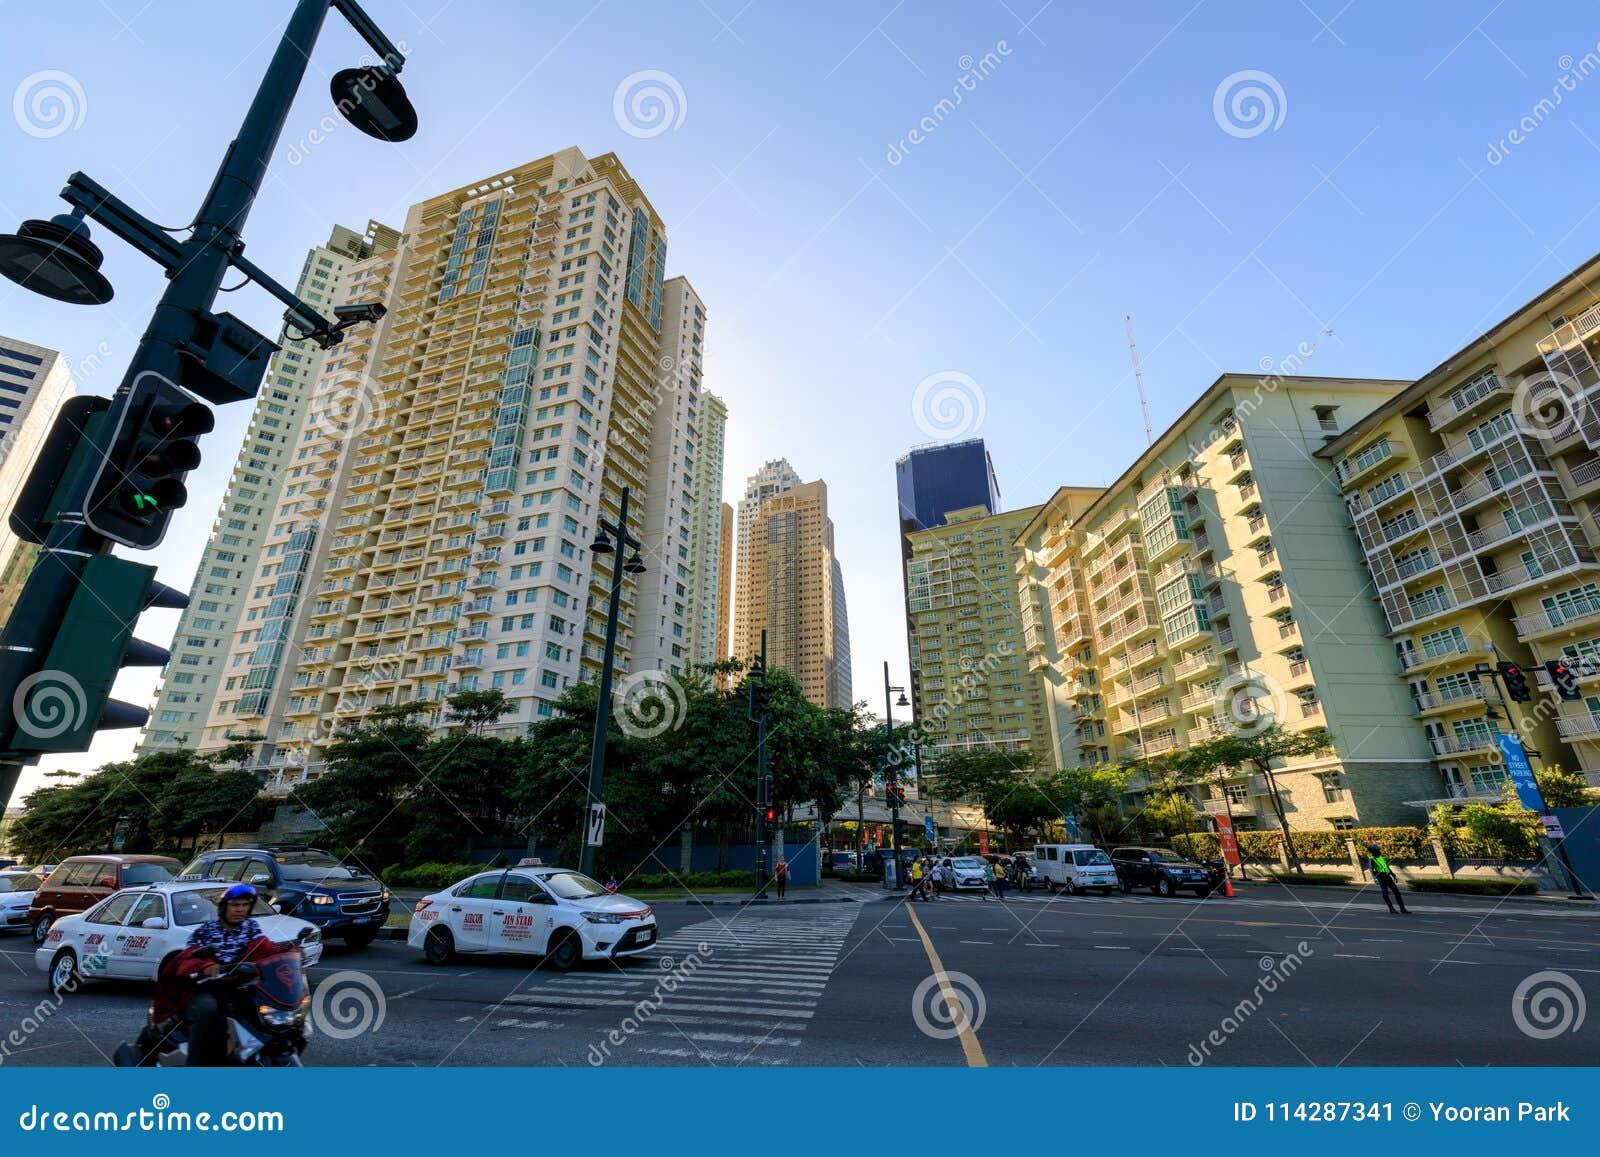 Serendra Residential Facade In Bonifacio Global City, Taguig